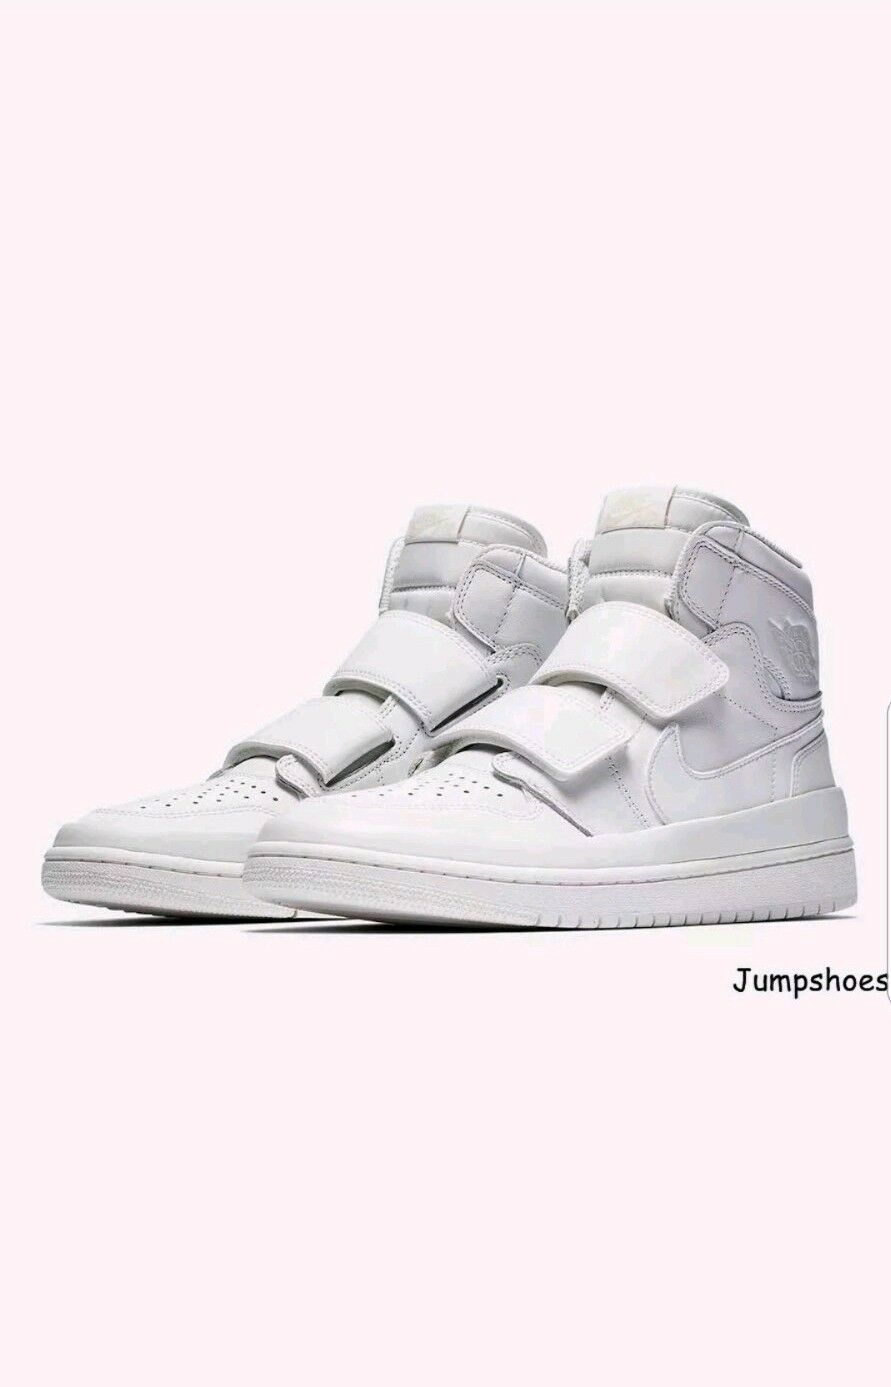 Air Jordan 1 Retro Alta Doppio Doppio Doppio Strap Summit bianca-Lifestyle Taglia 9 UK-AQ7924-100 89212d